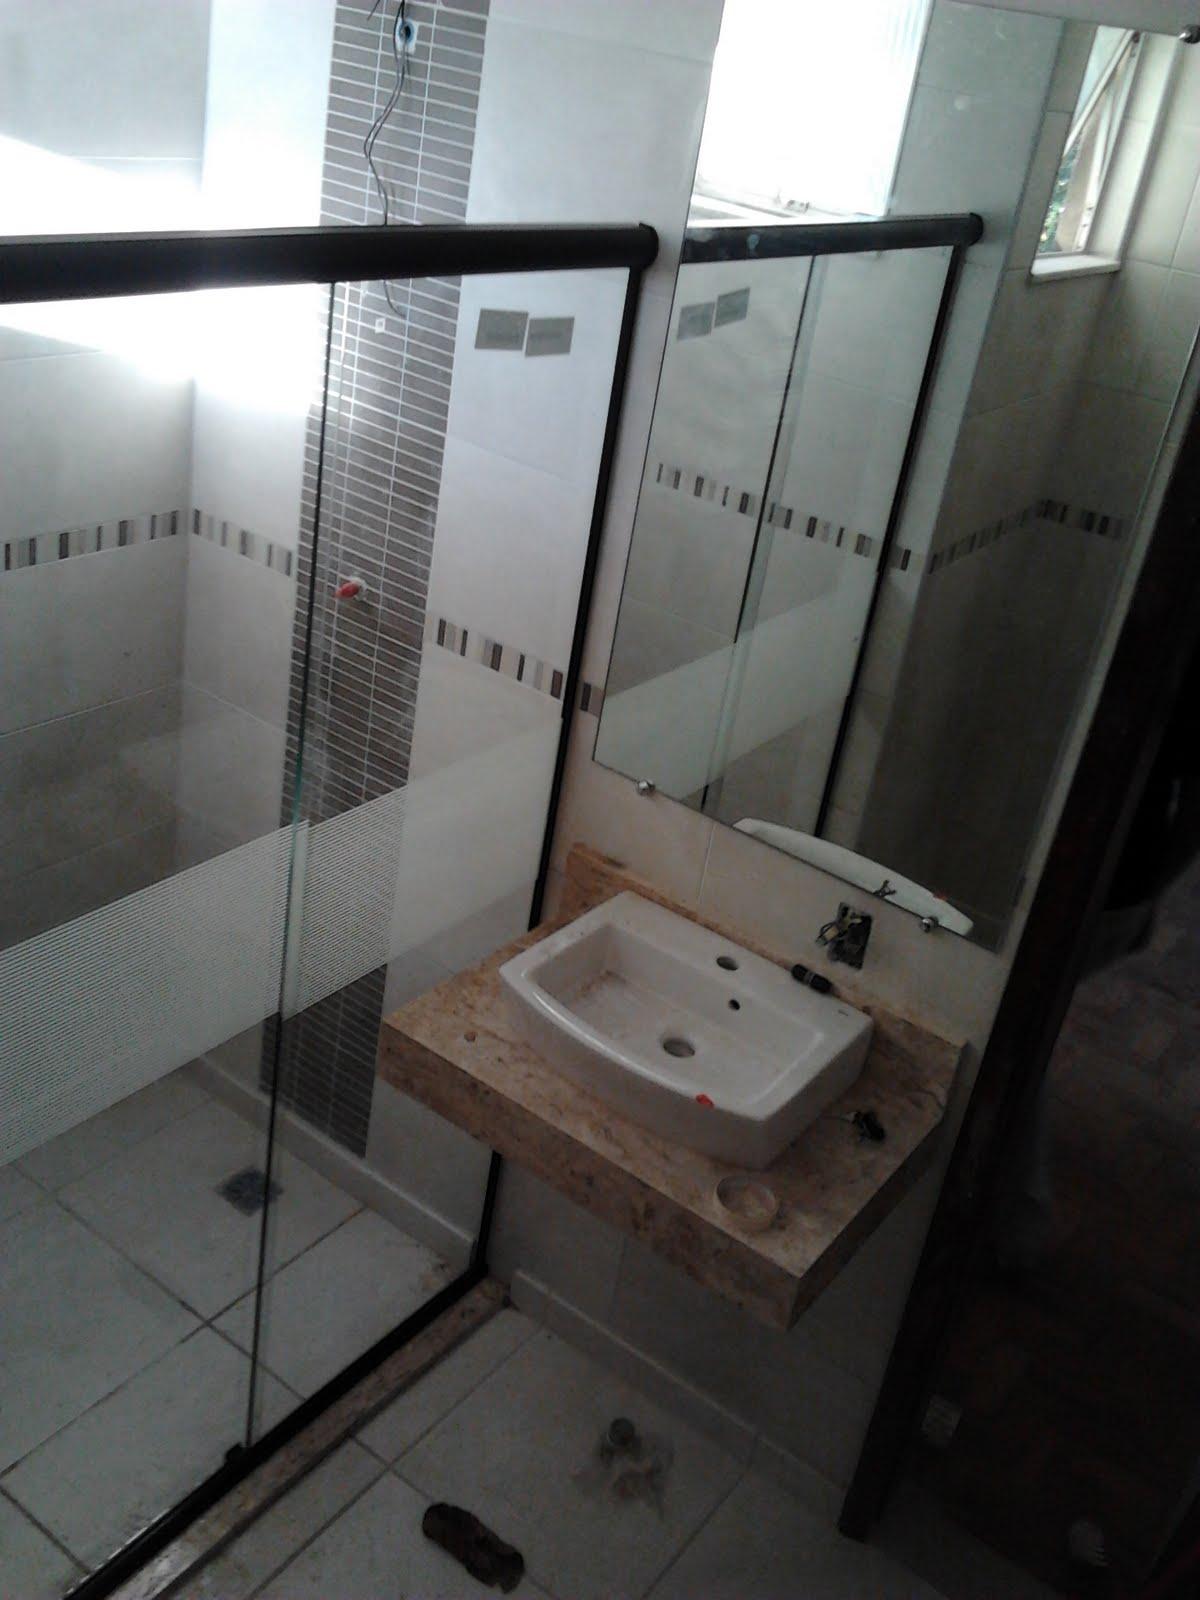 Agora a faixa no box do banheiro pra evitar que o lesado aqui tente  #5B4E45 1200x1600 Adesivo Box Banheiro Curitiba